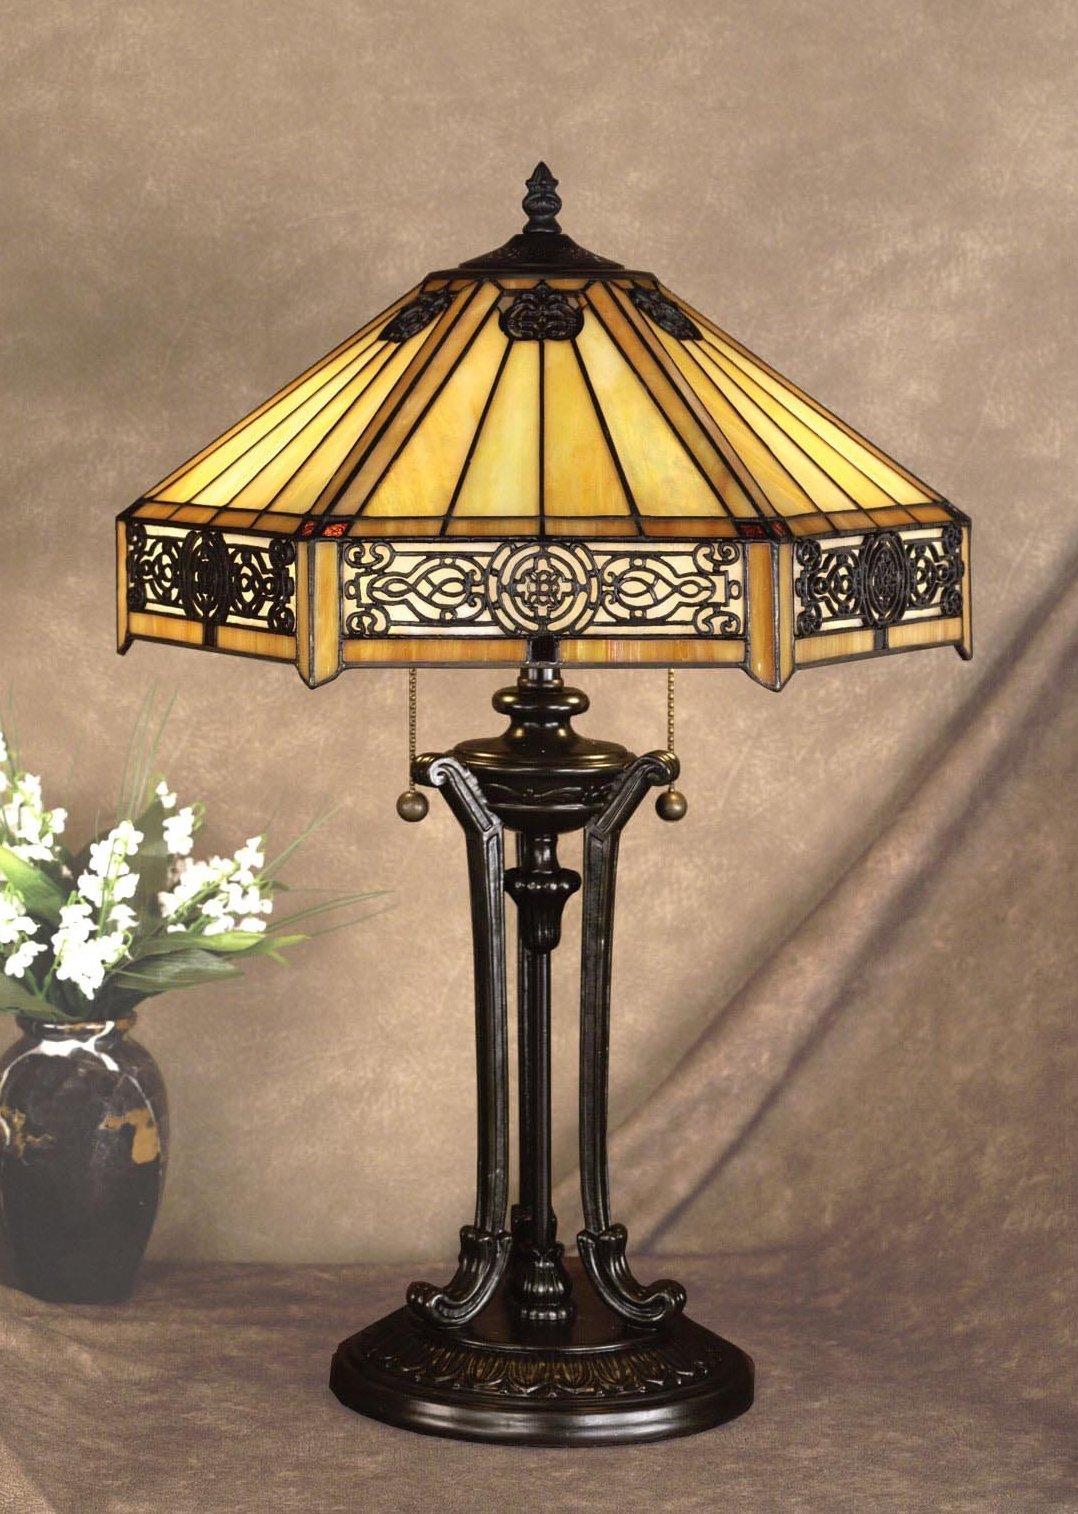 #2 Vintage Style Lamp